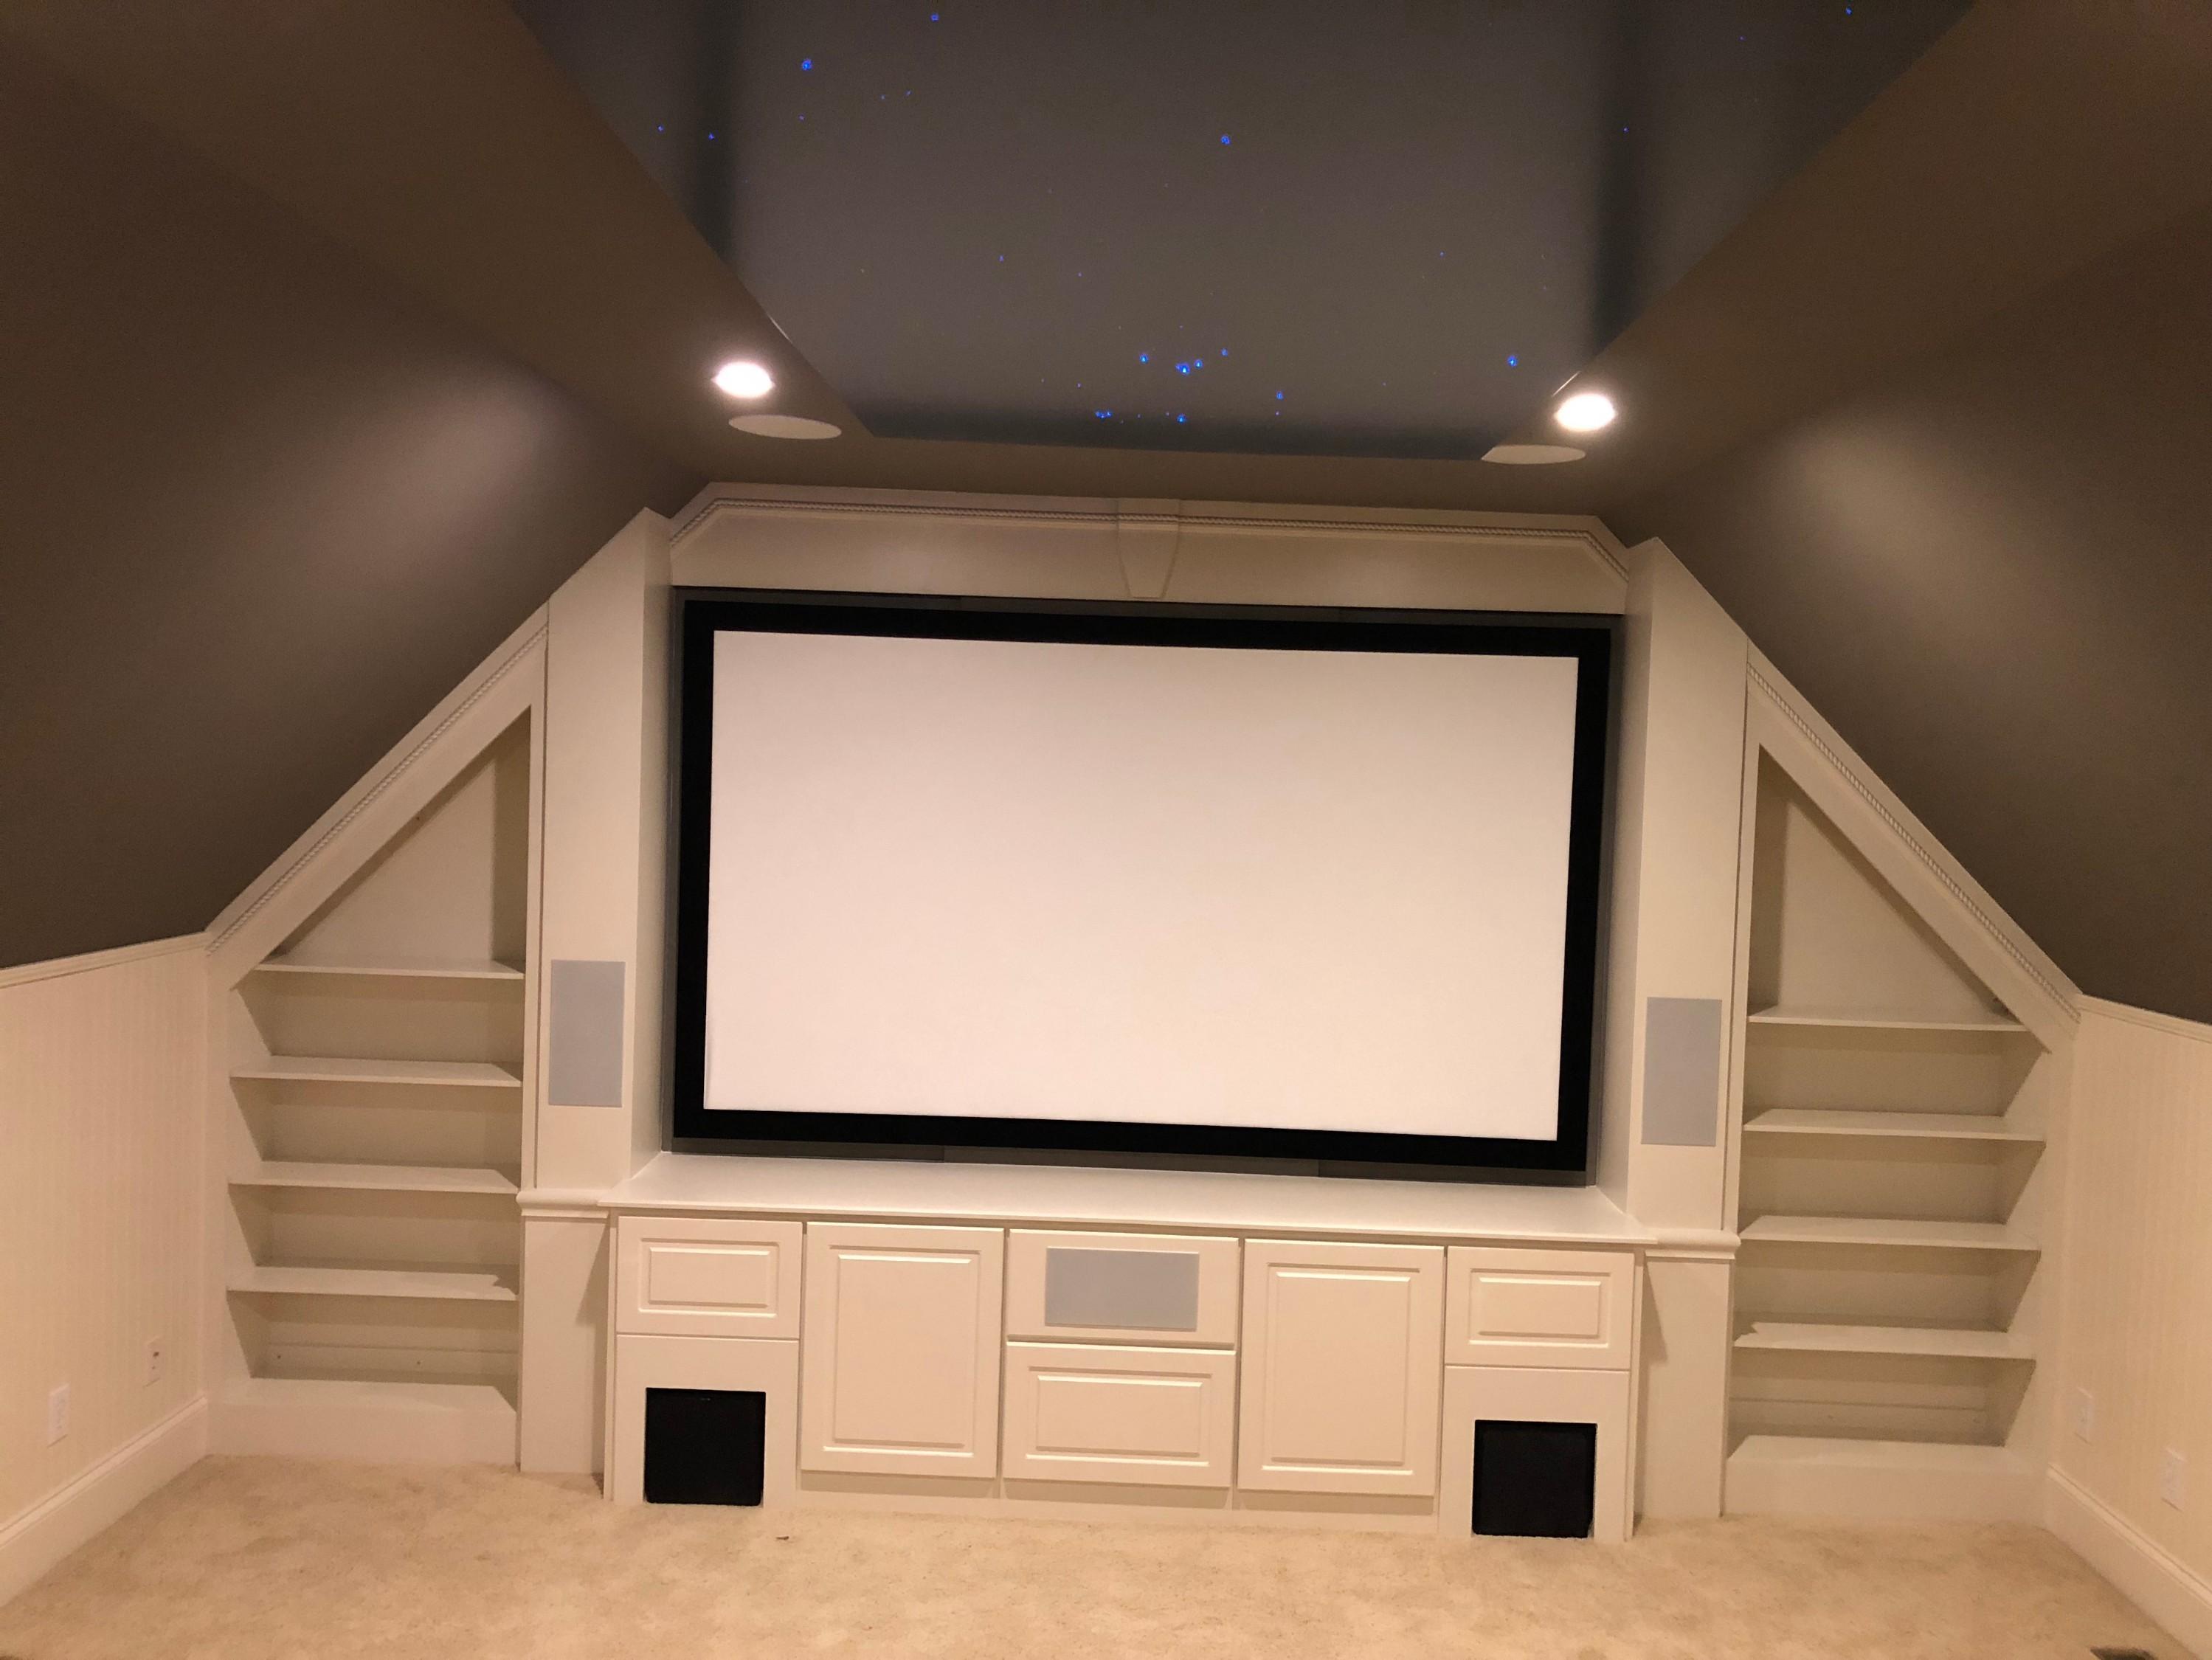 Proscenium with Bookshelves